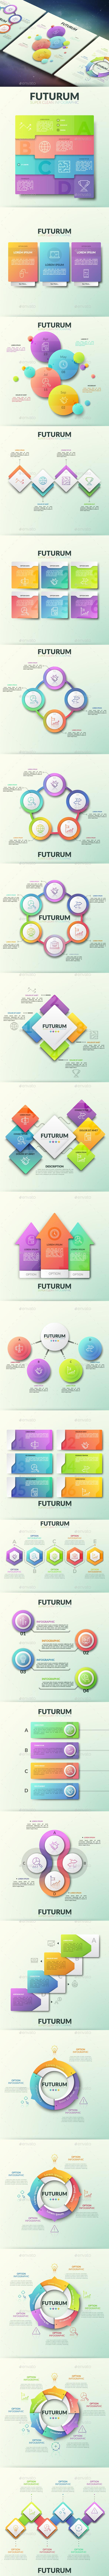 Futurum Infographic - Infographics